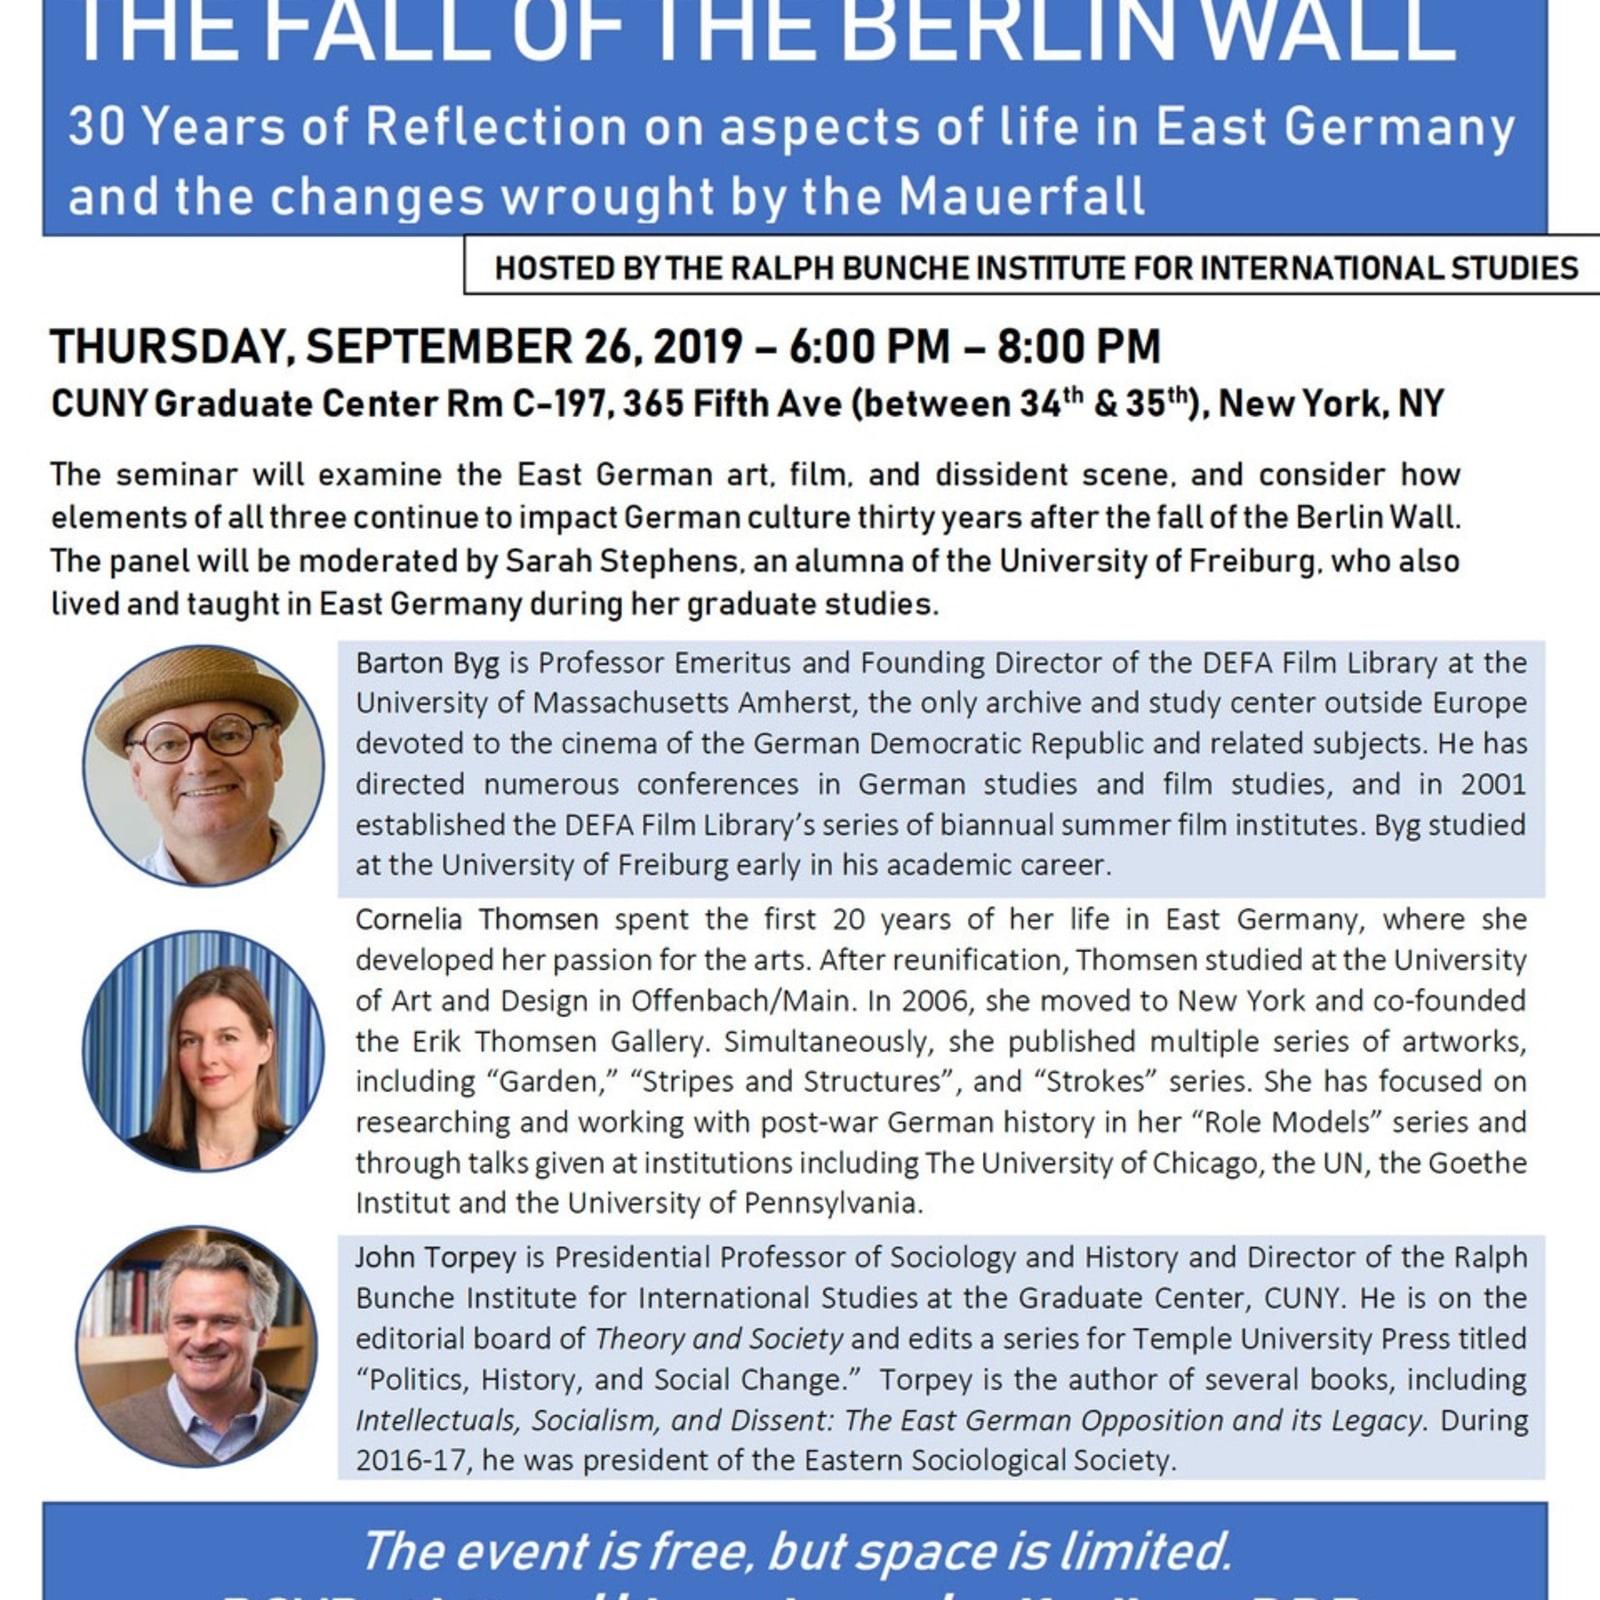 Invitation to seminar at CUNY Graduate Center